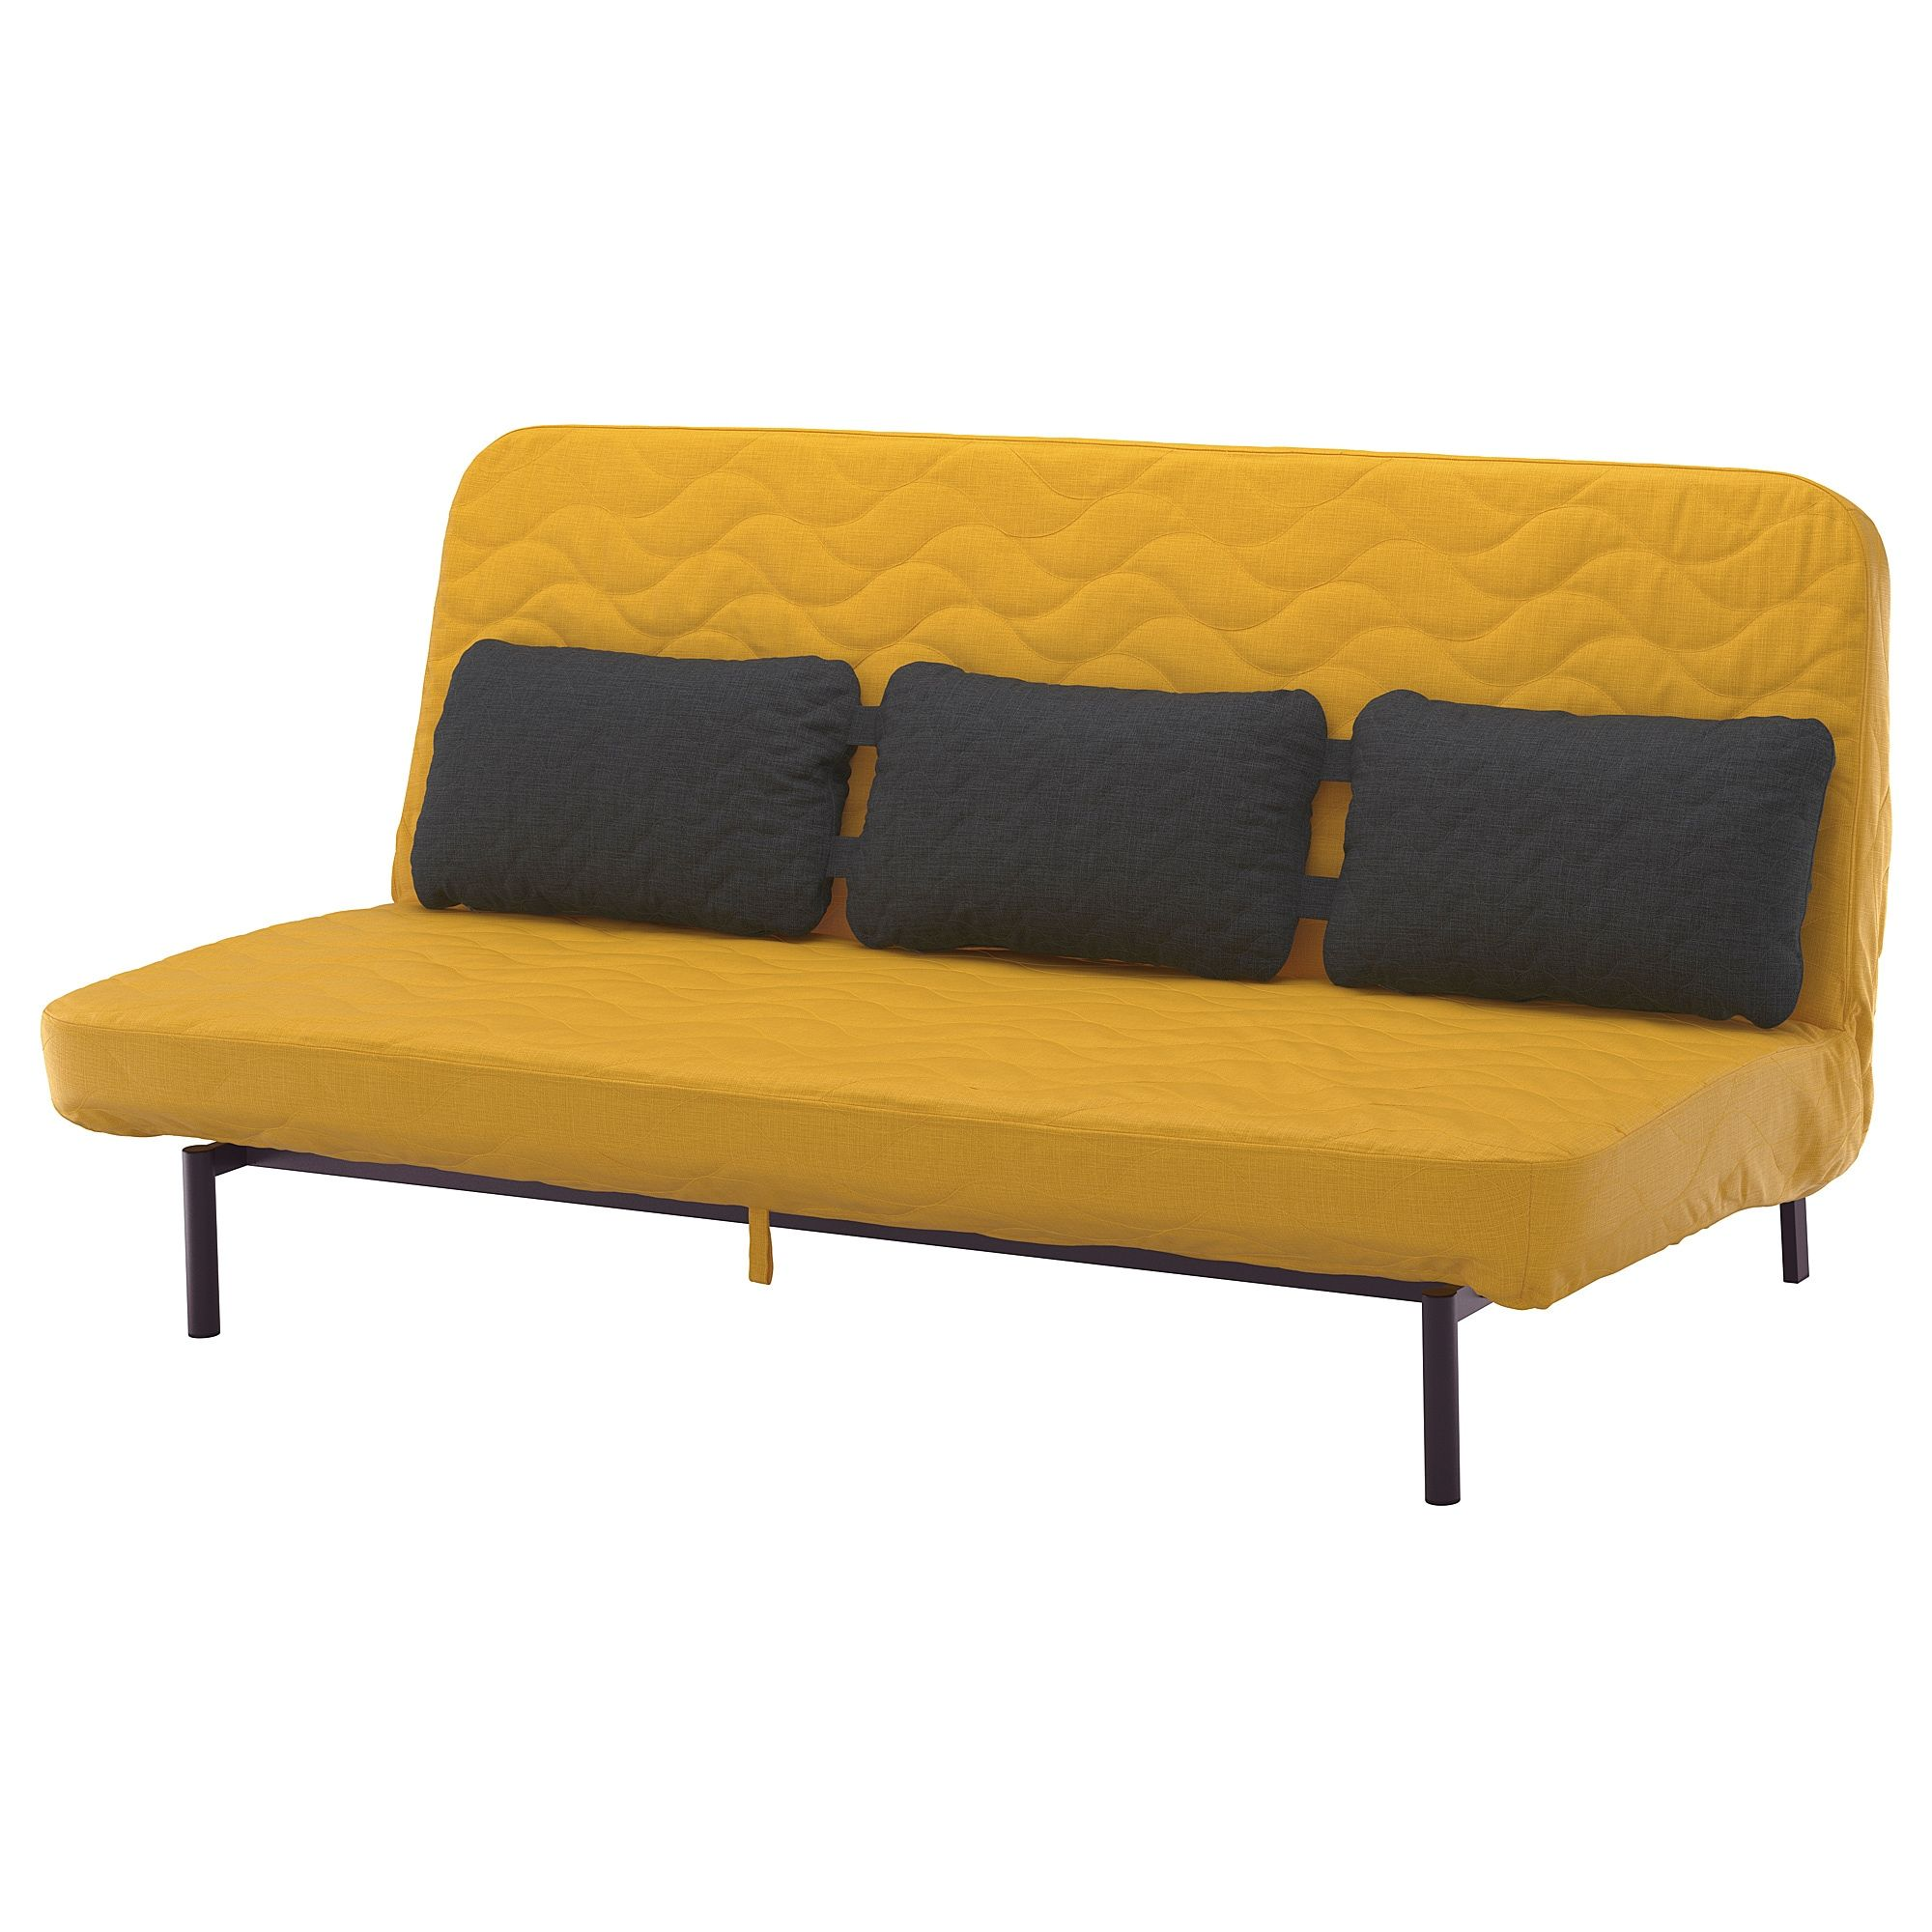 Nyhamn Sleeper Sofa With Triple Cushion With Pocket Spring